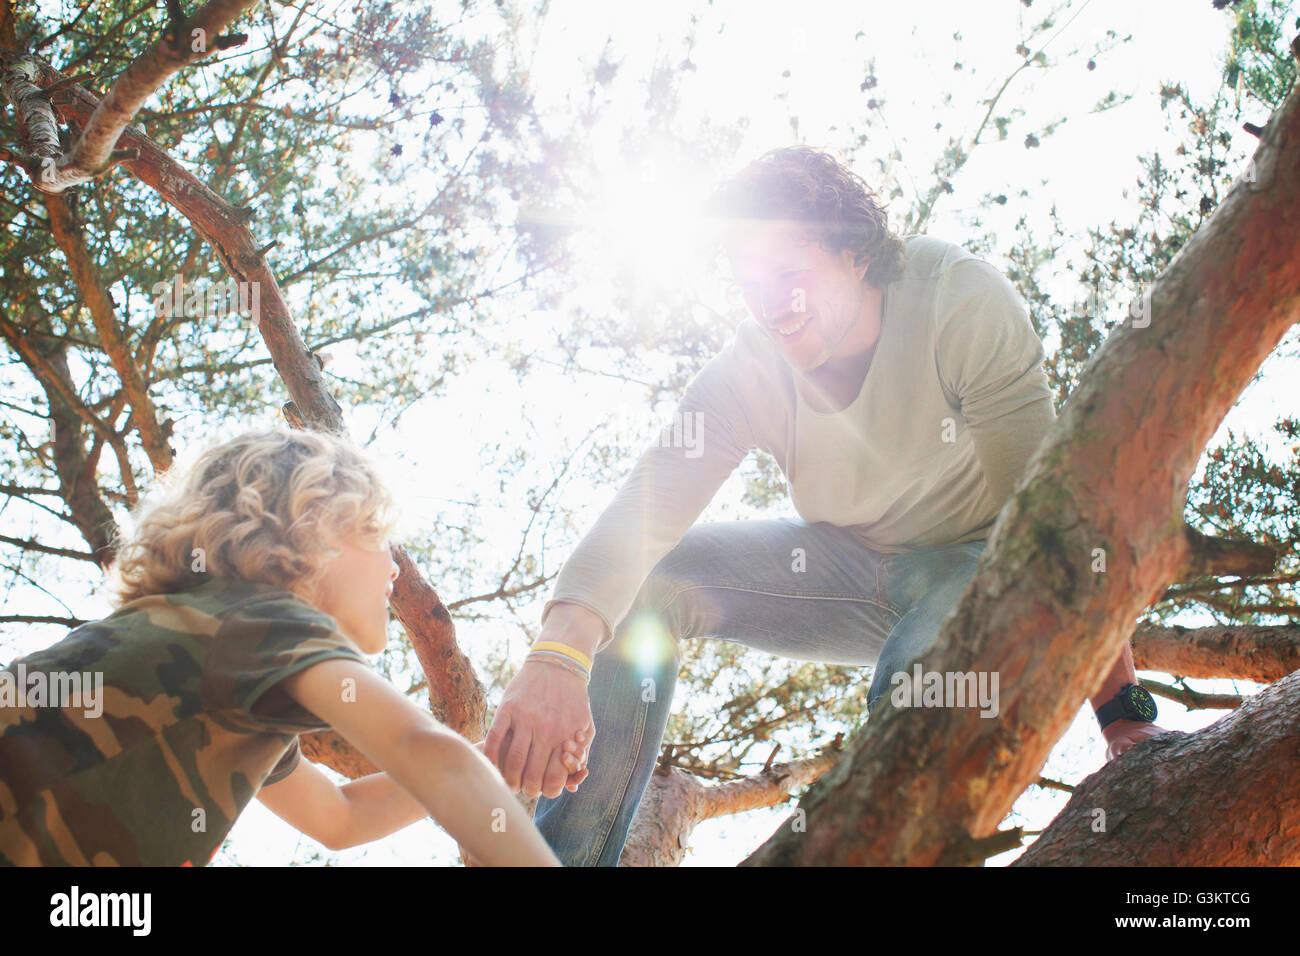 Padre e hijo árbol de escalada Imagen De Stock